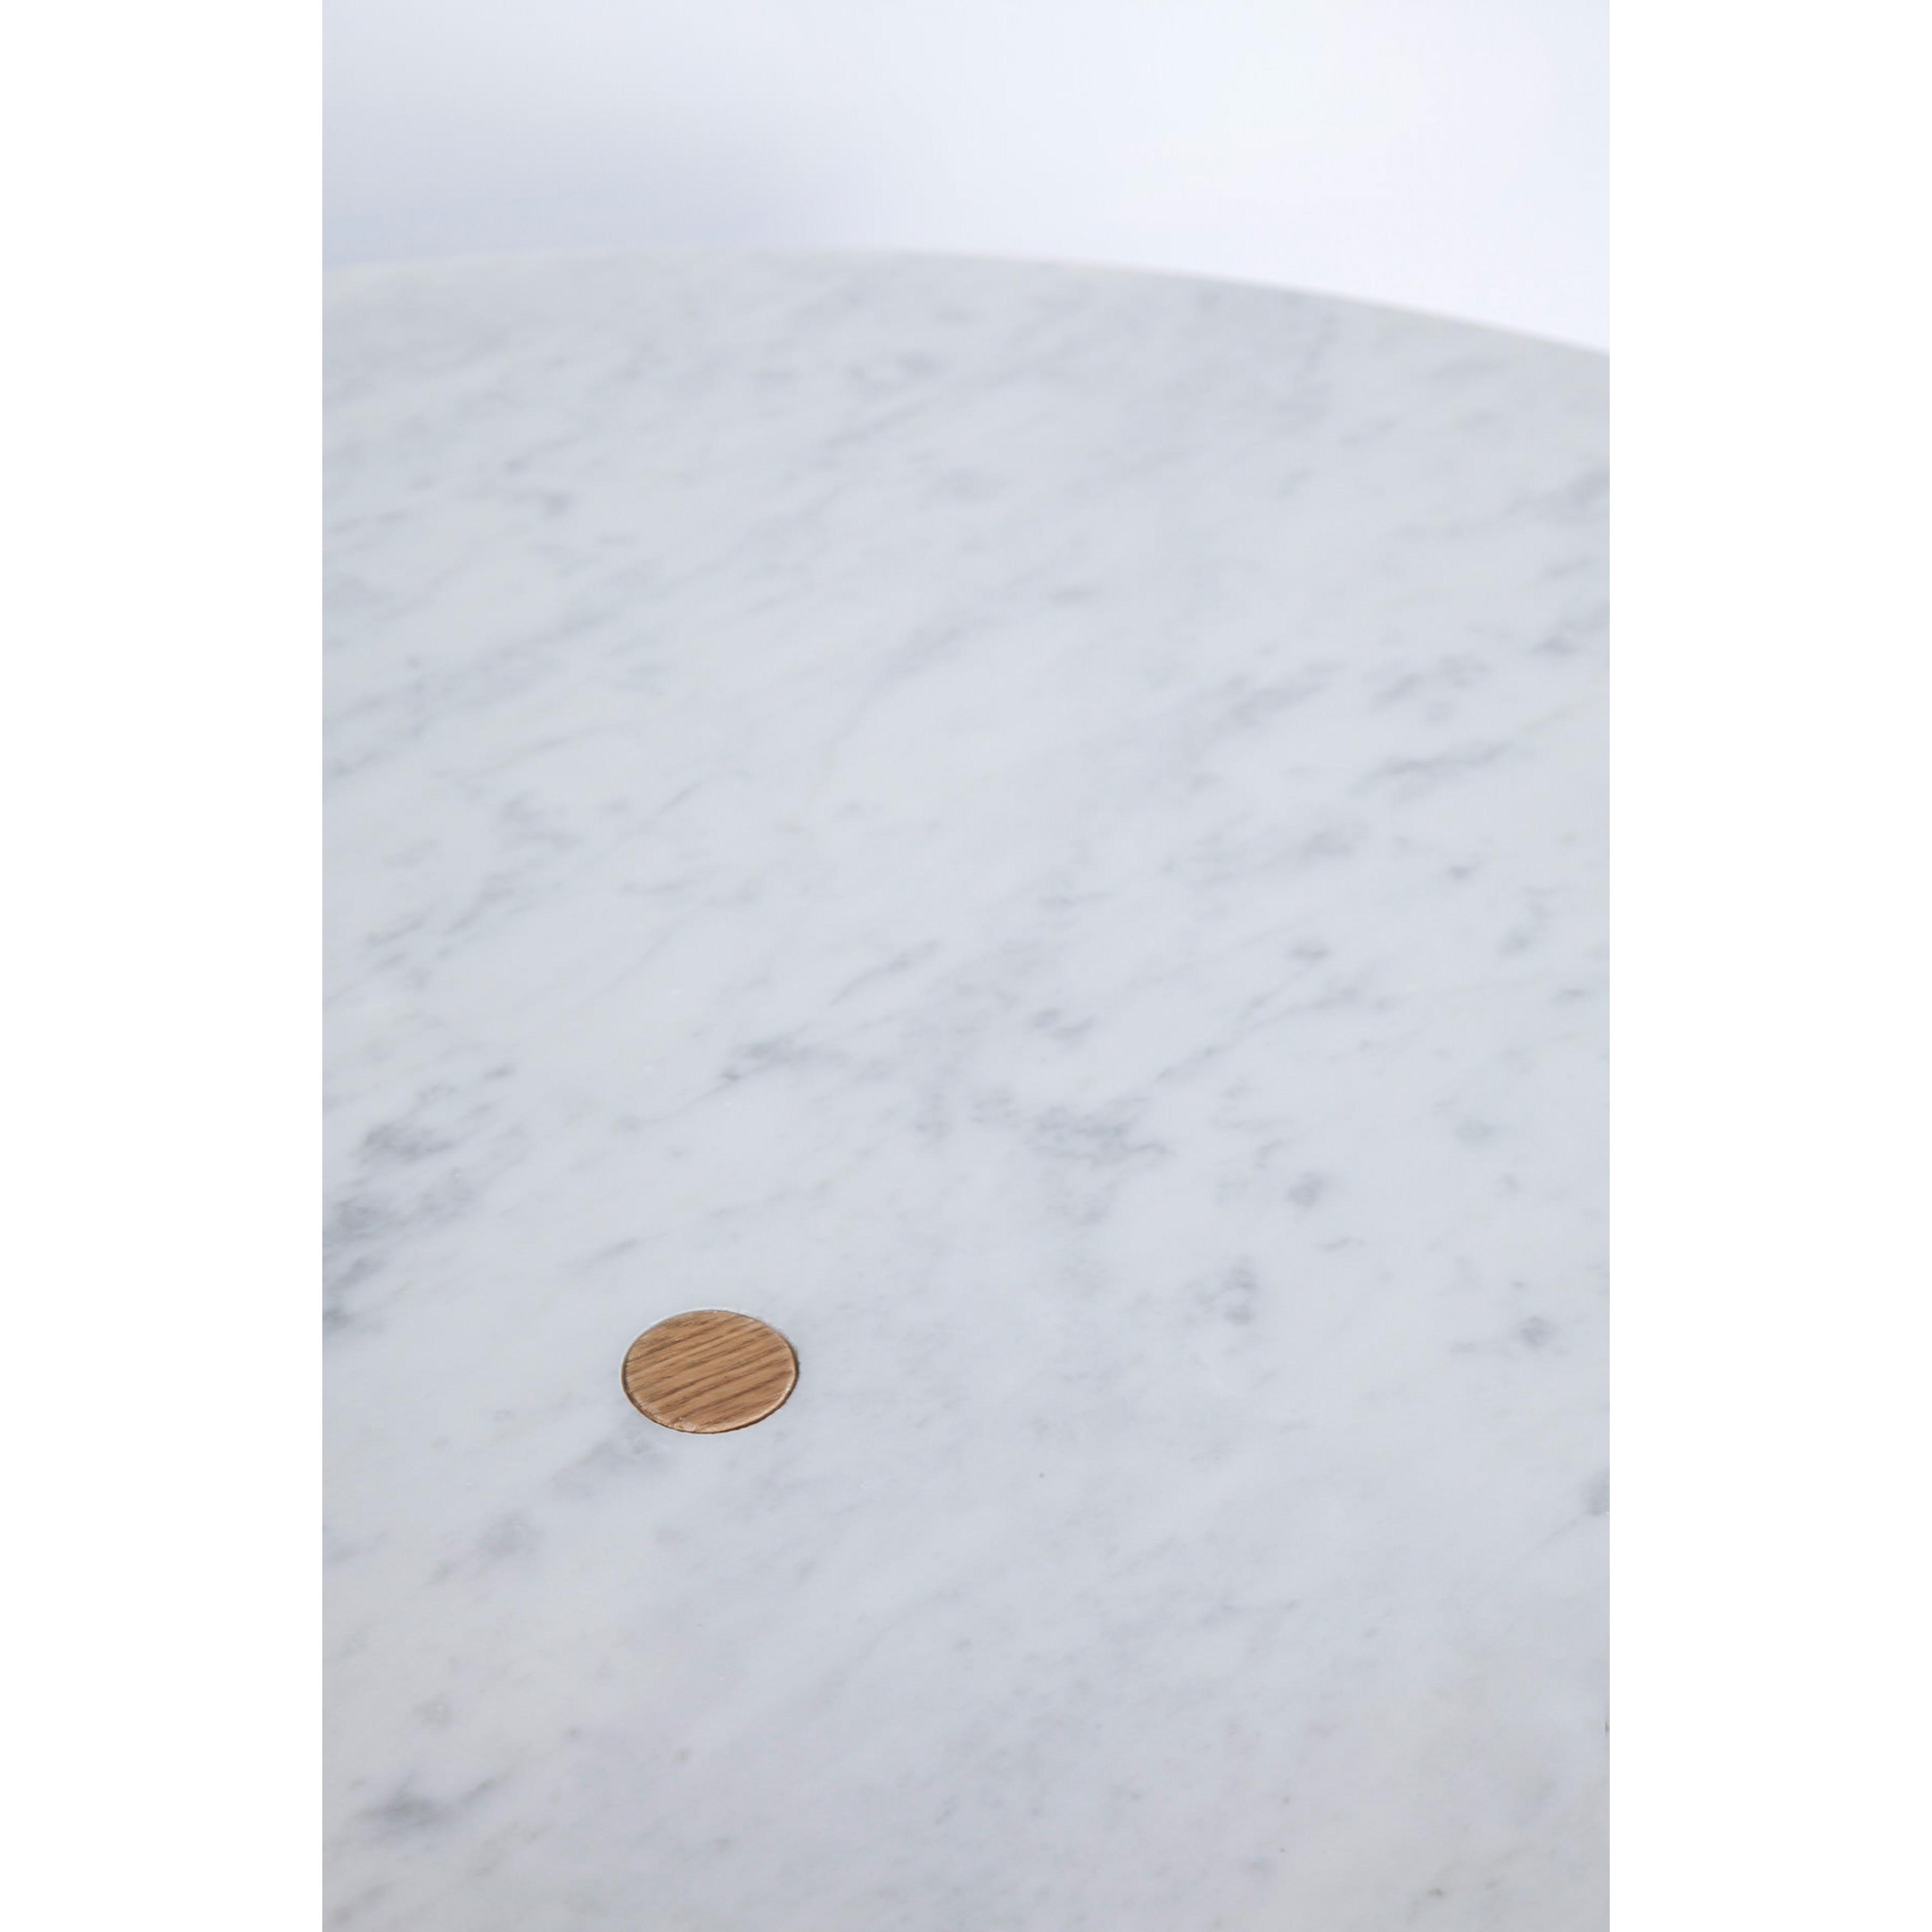 Tisch Arthur's Remix-Ø107 cm